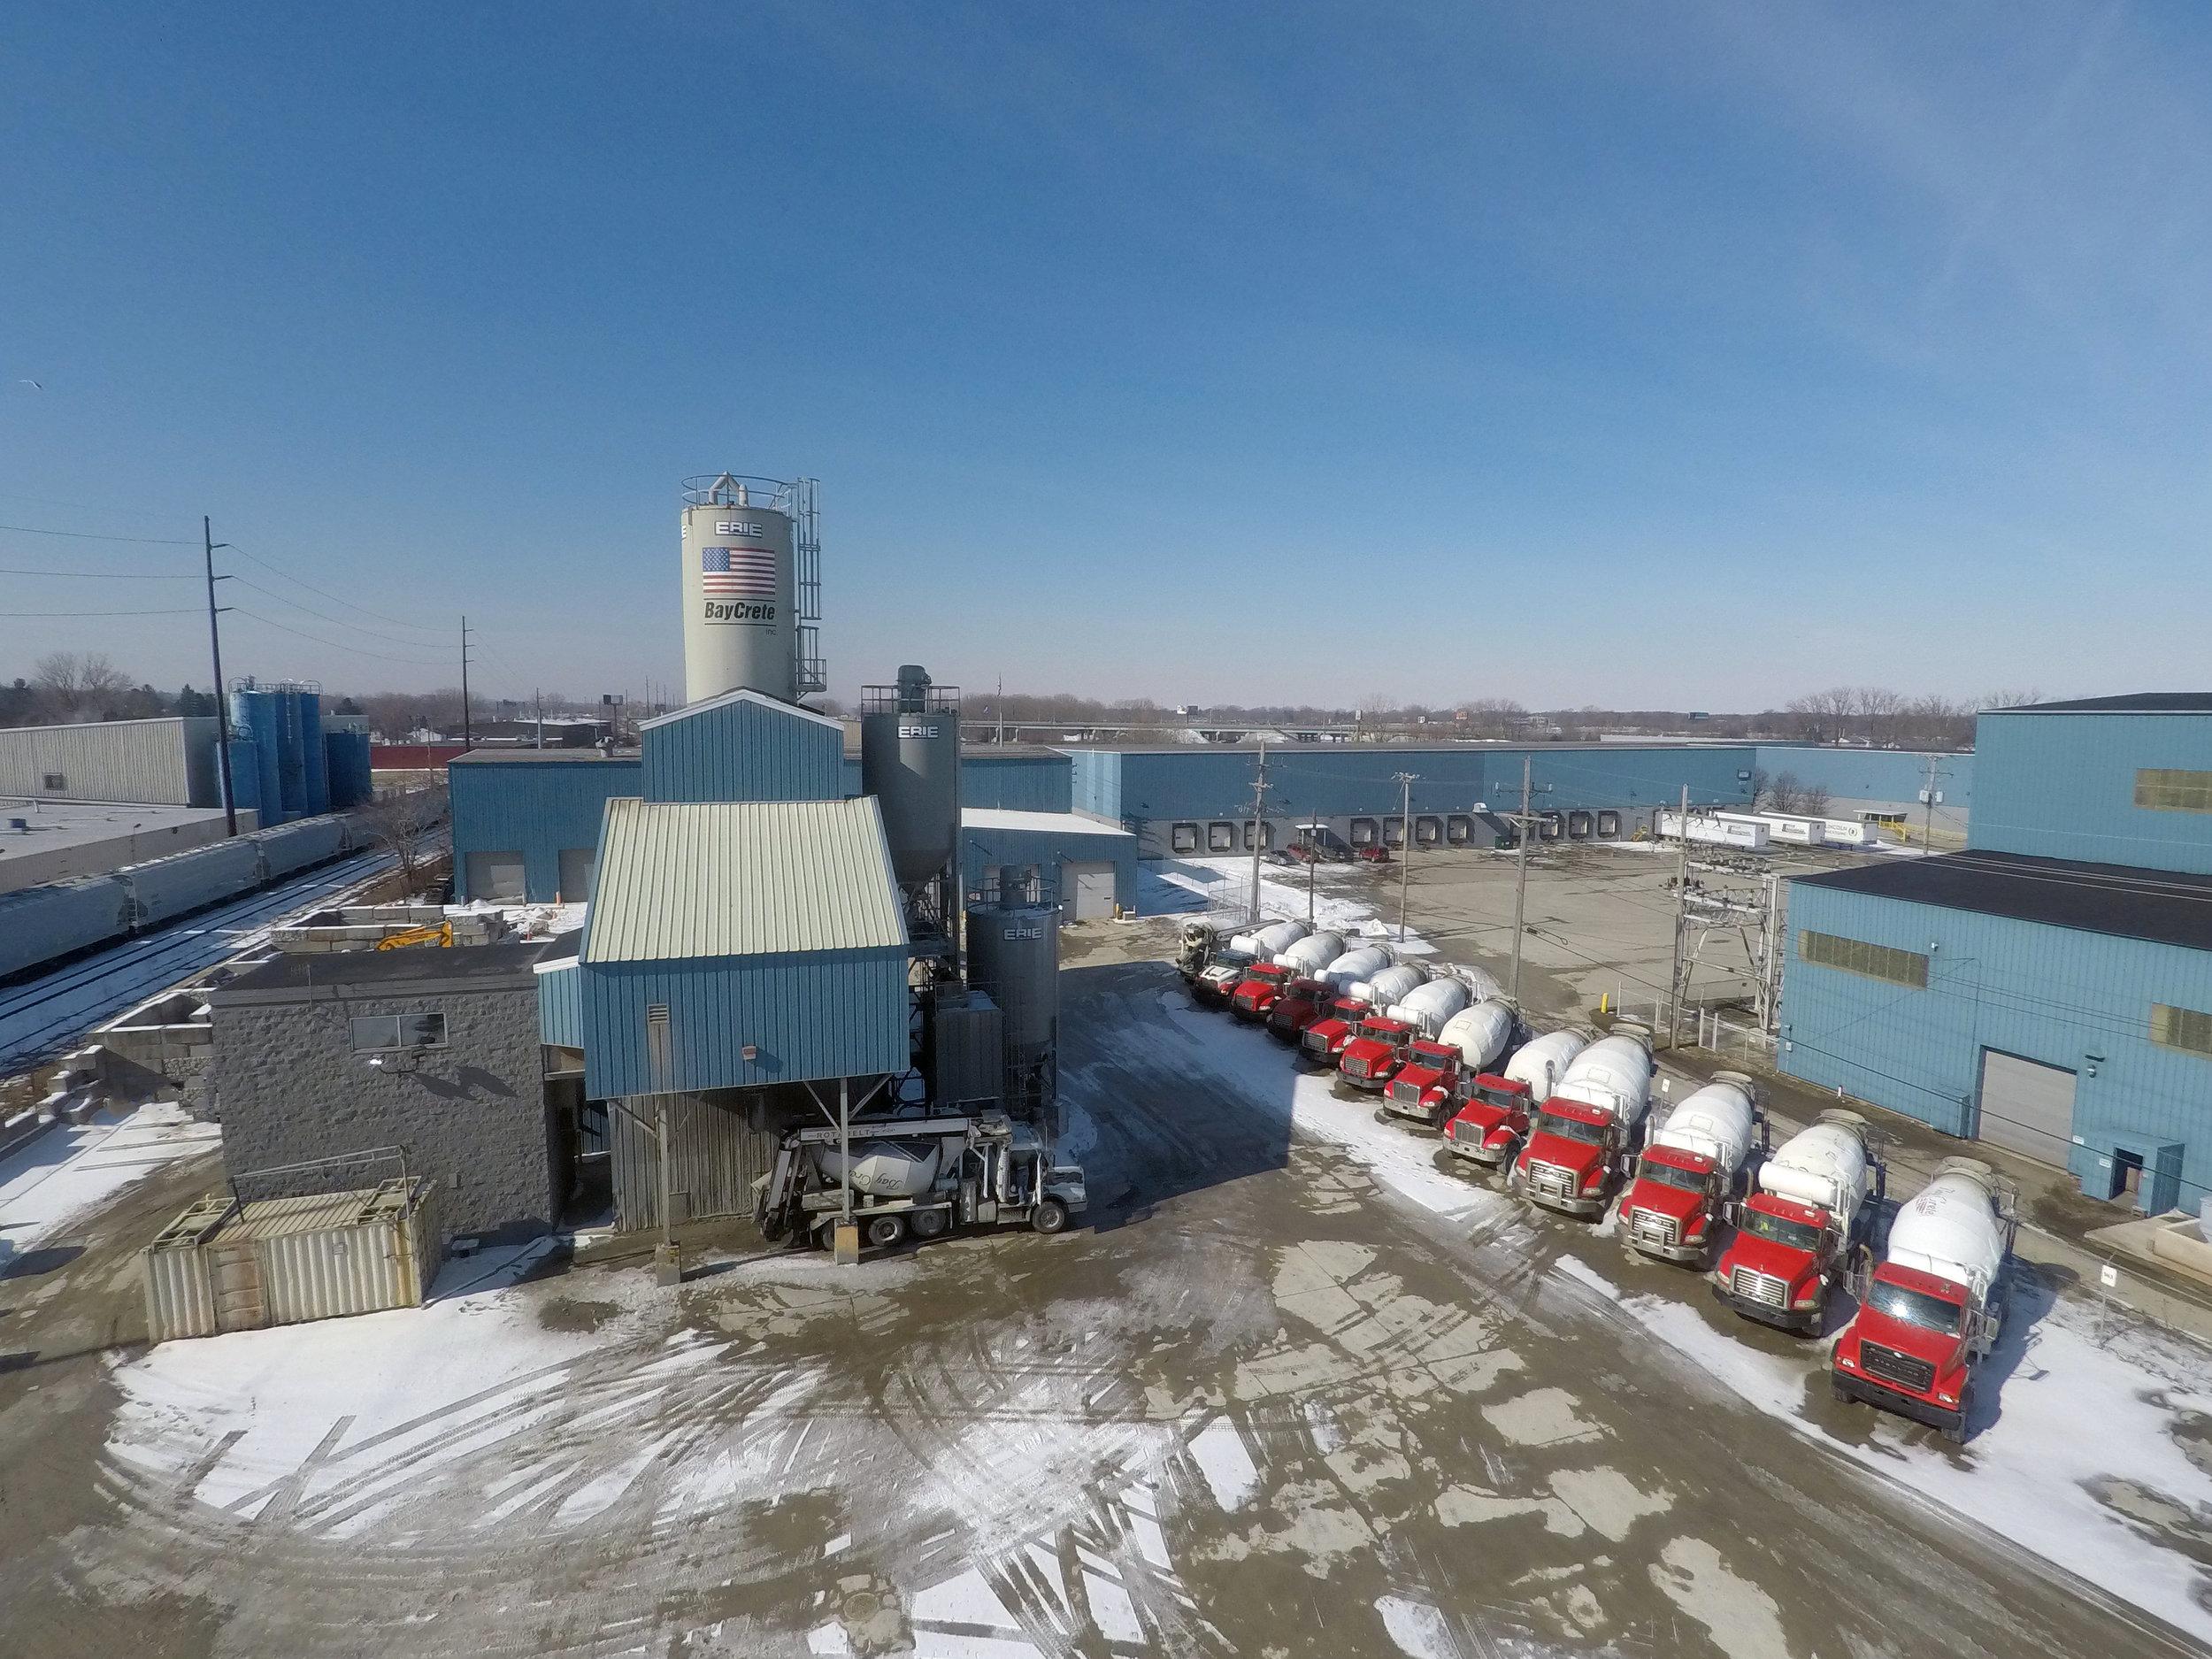 "BayCrete, Inc. 18 Mixer Truck Fleet – 10 yard + Mixers*    1 – 60'0"" Retractable Theam Conveyor 1 – 50'0"" Retractable Theam Conveyor 1 – 50'0"" Retractable Roto-Belt Conveyor 1 – 40'0"" Fixed Theam Conveyor"